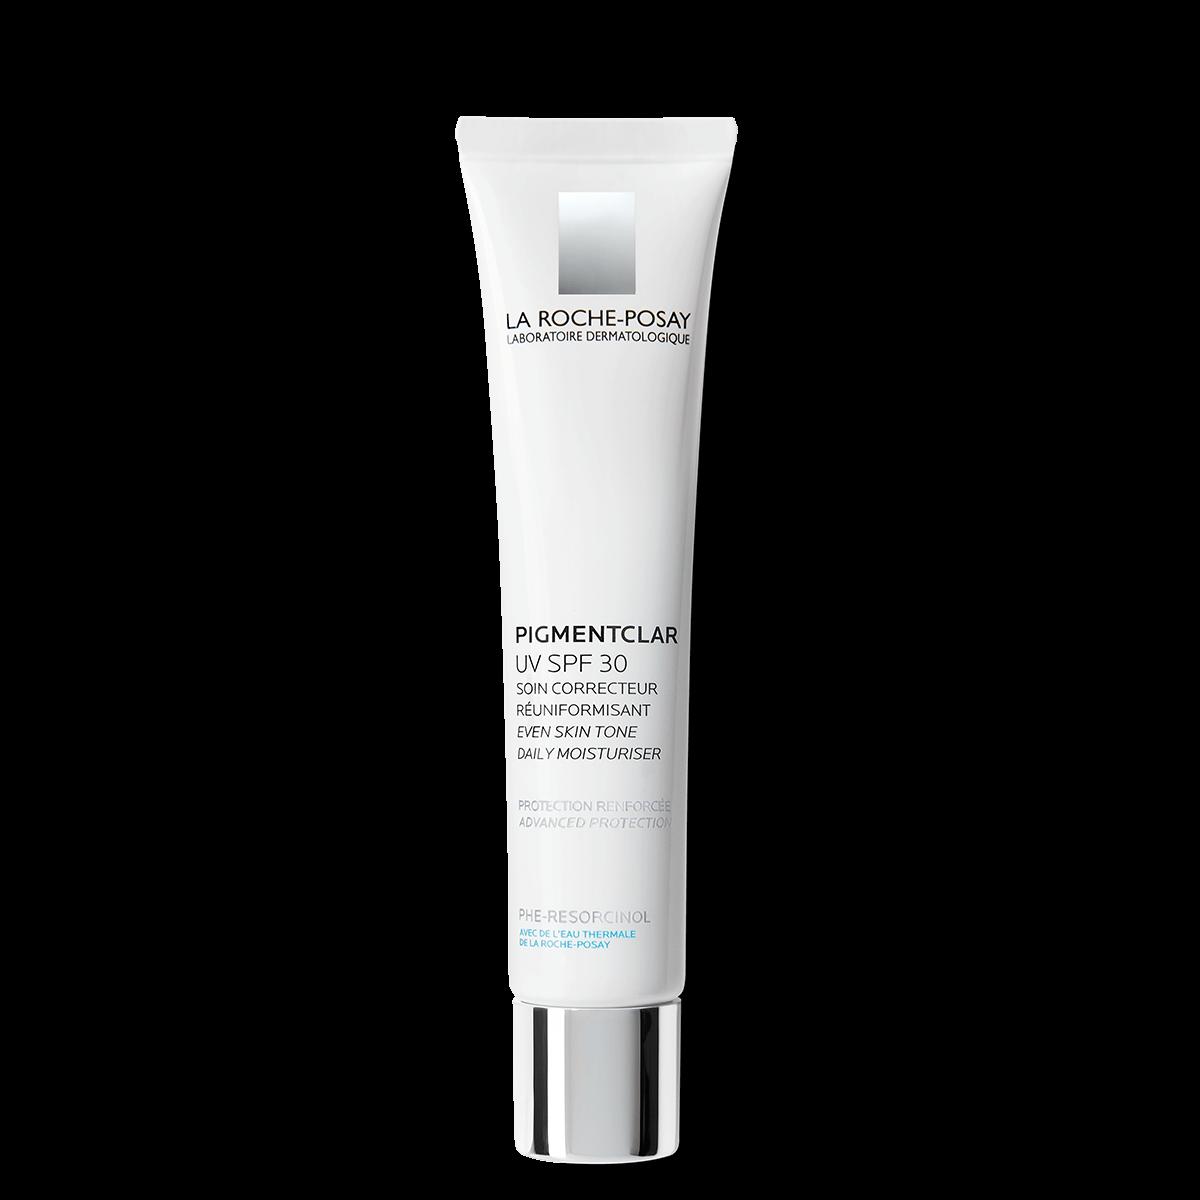 La Roche Posay Produktsida Anti-aging Pigmentclar UV Spf30 Moisturizer